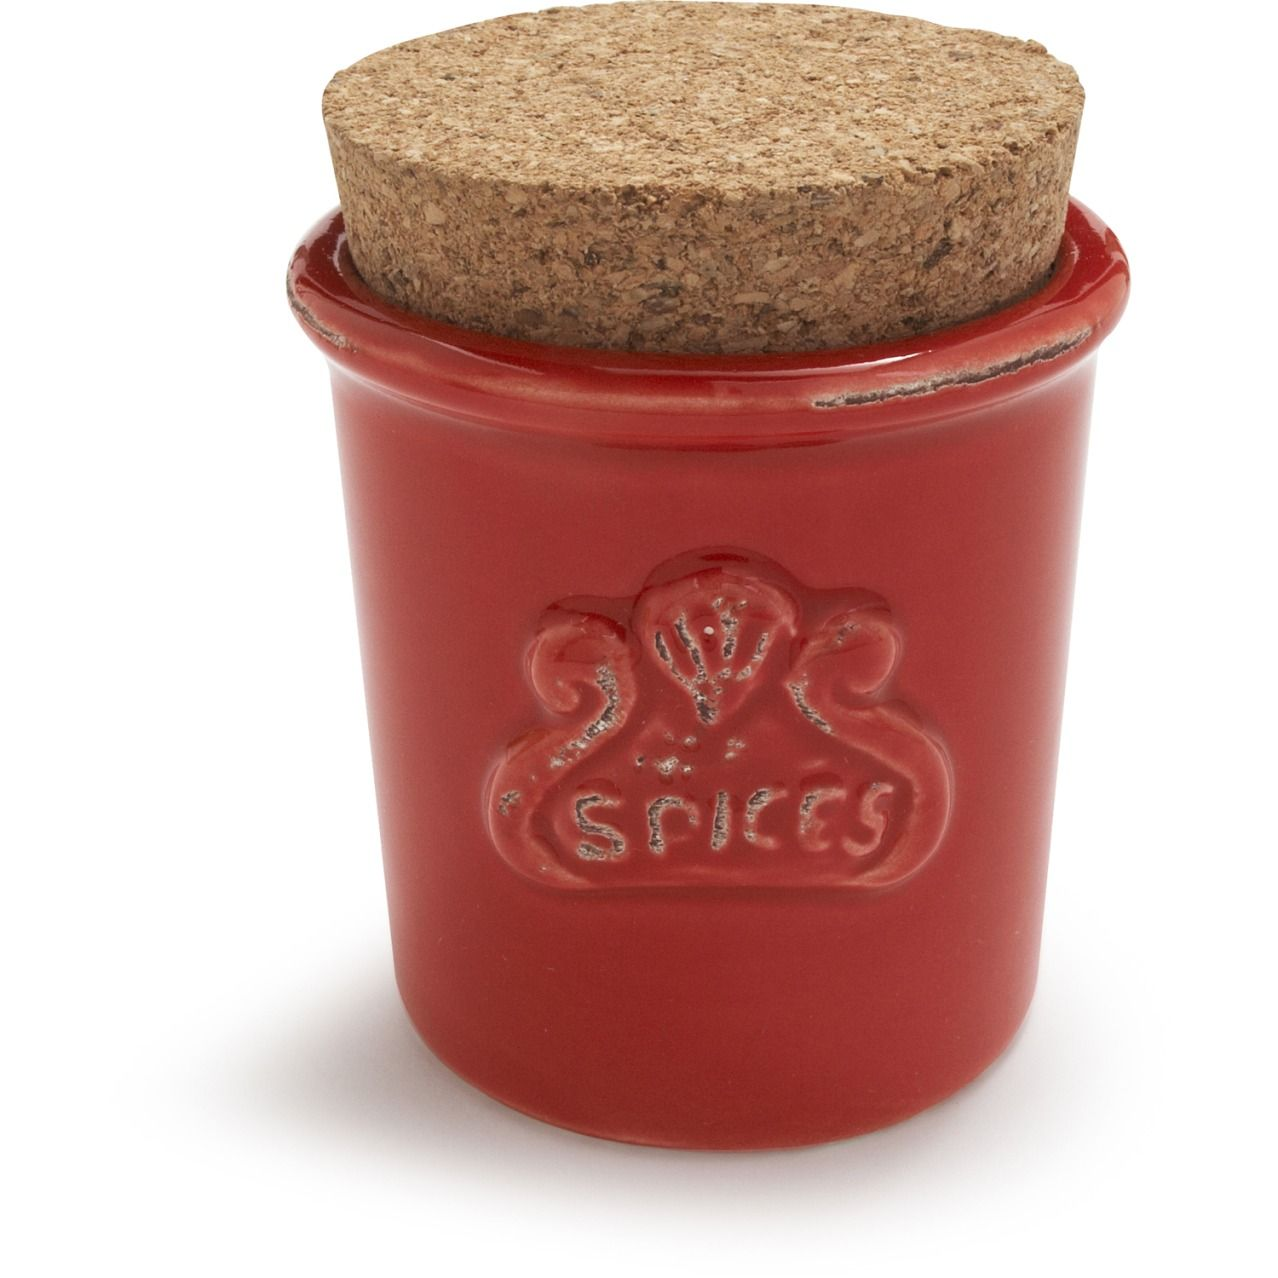 Italian Ceramic Spice Jars And Corks At Sur La Table